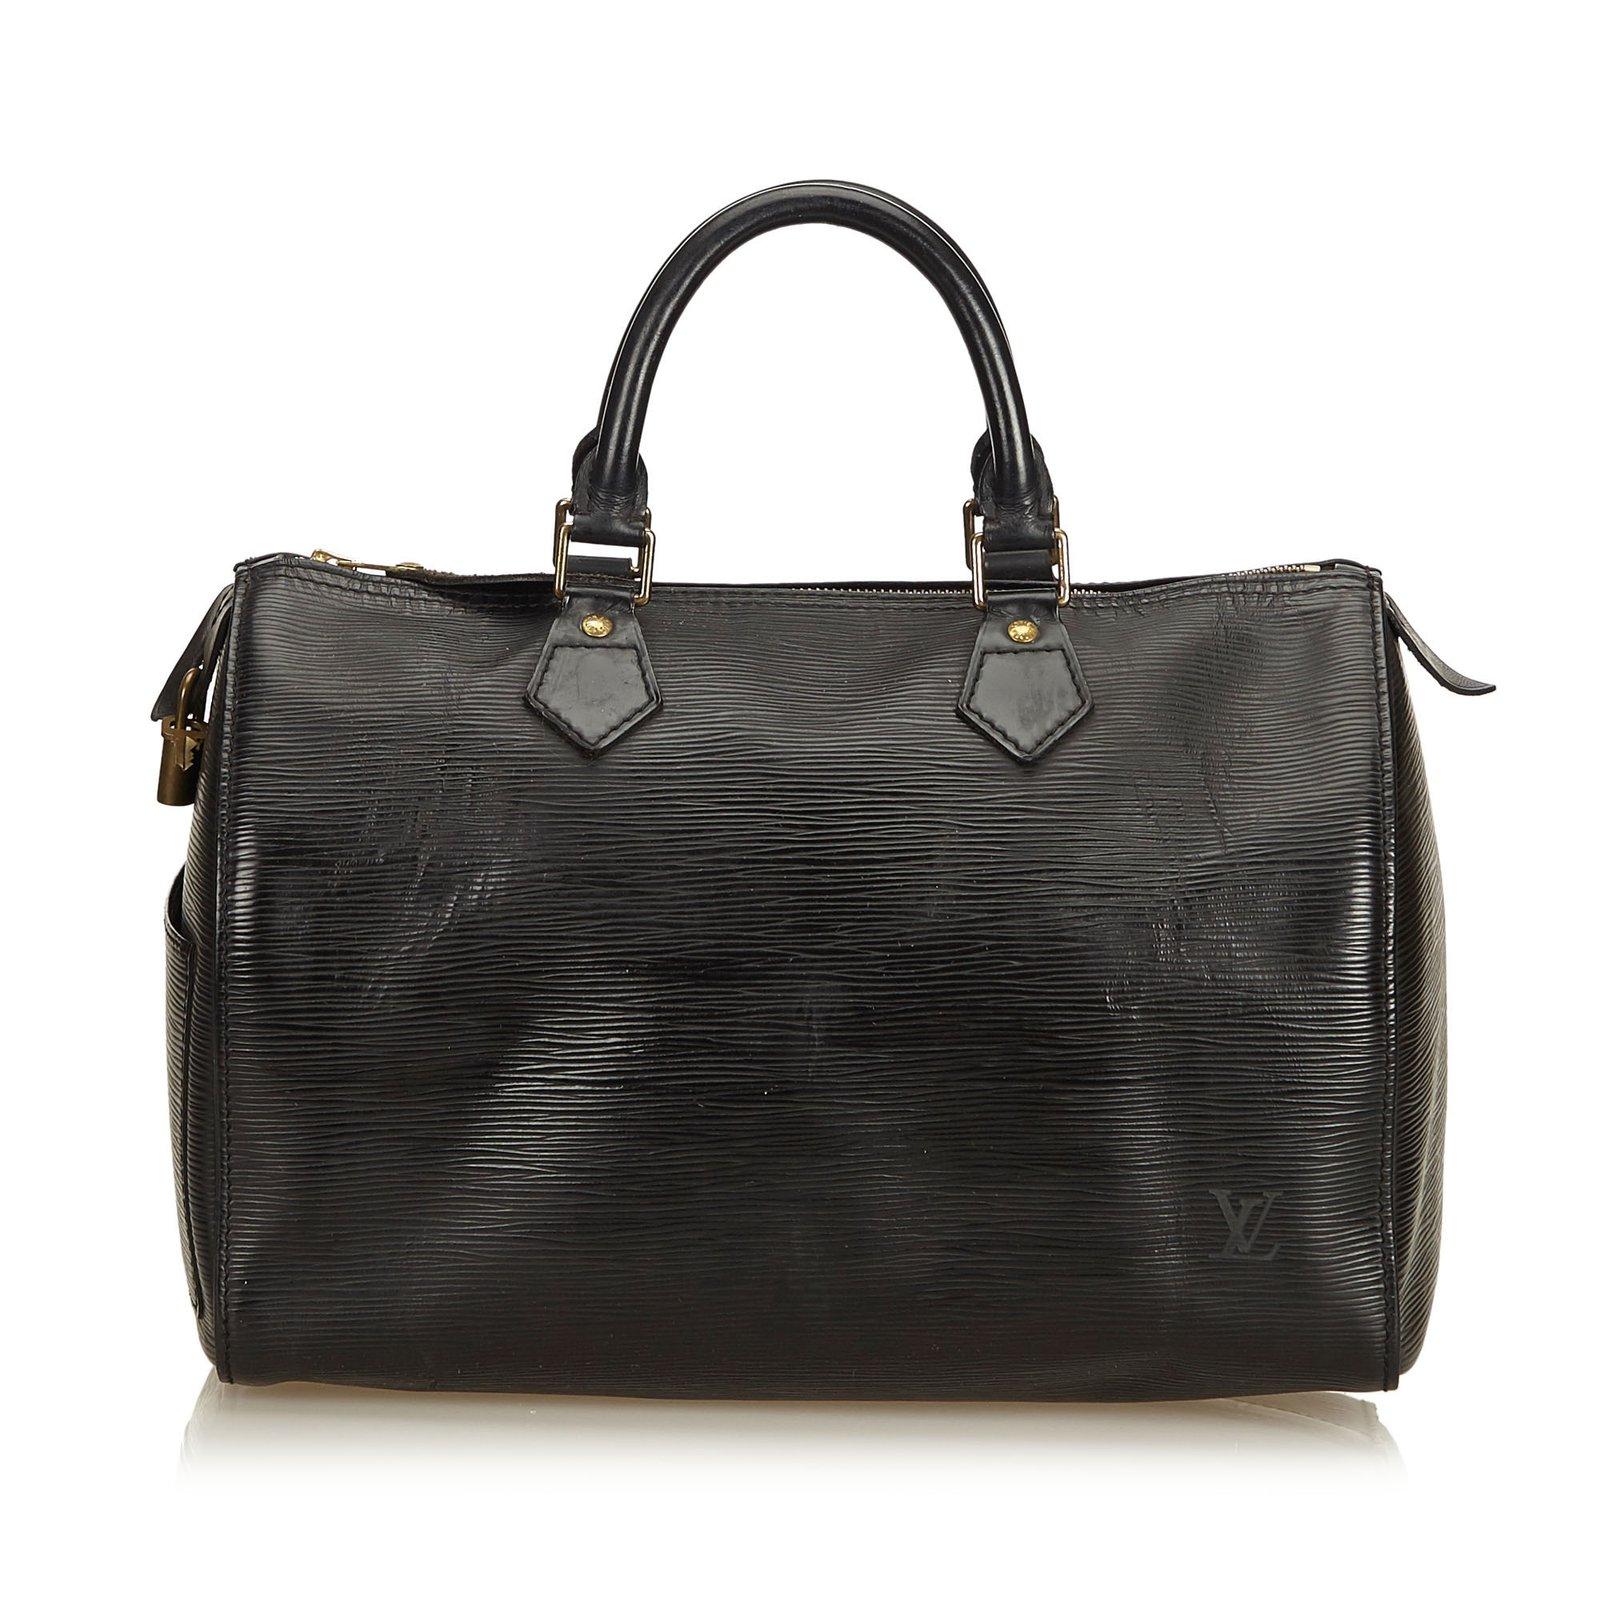 08dab39992e4 Louis Vuitton Epi Speedy 30 Handbags Leather Black ref.87187 - Joli ...